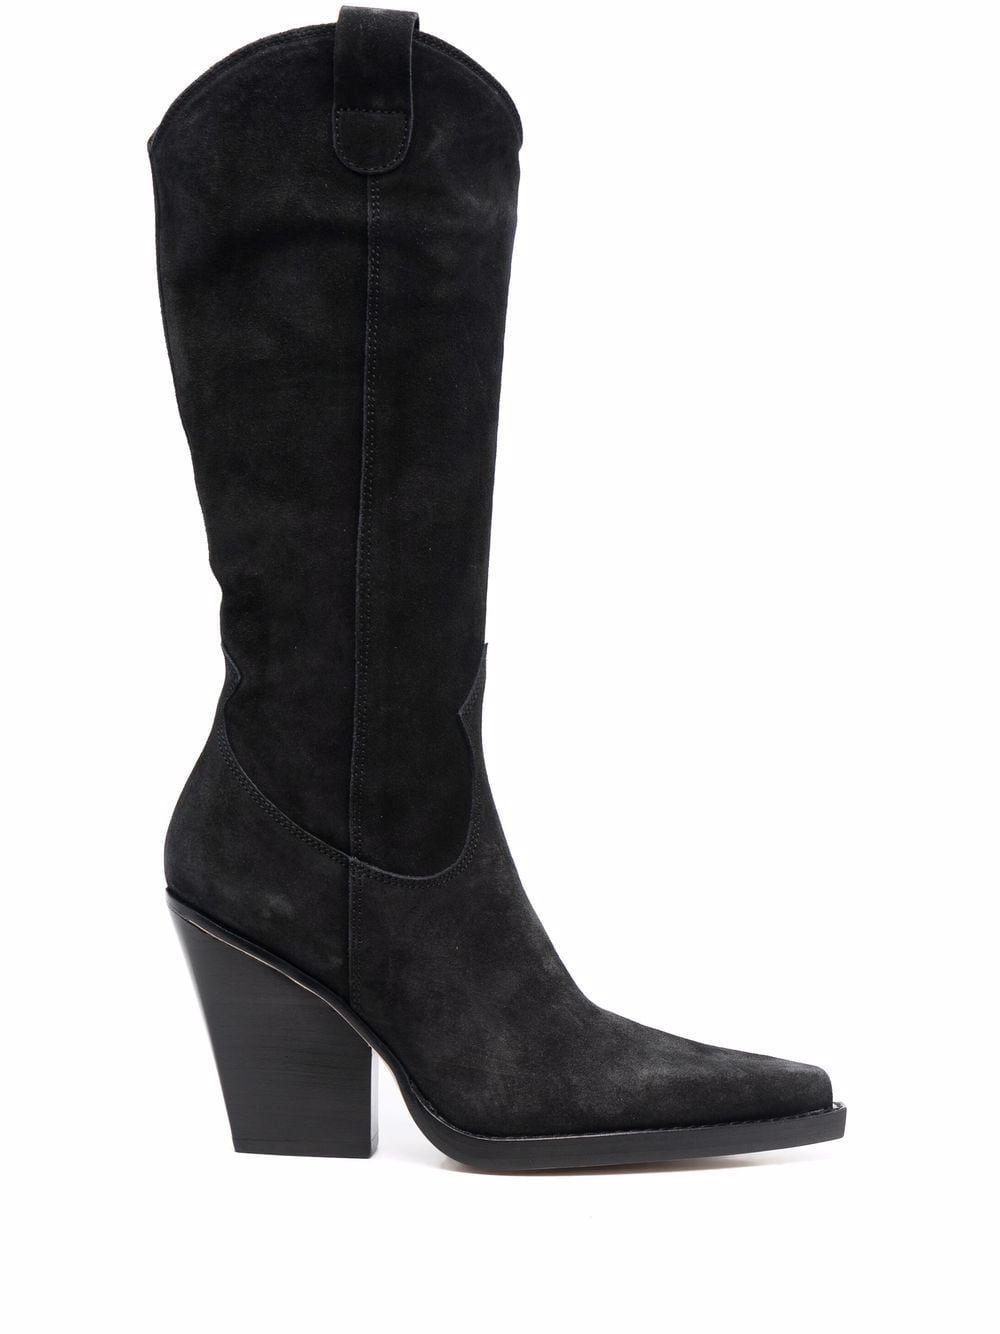 Velvet texan boots